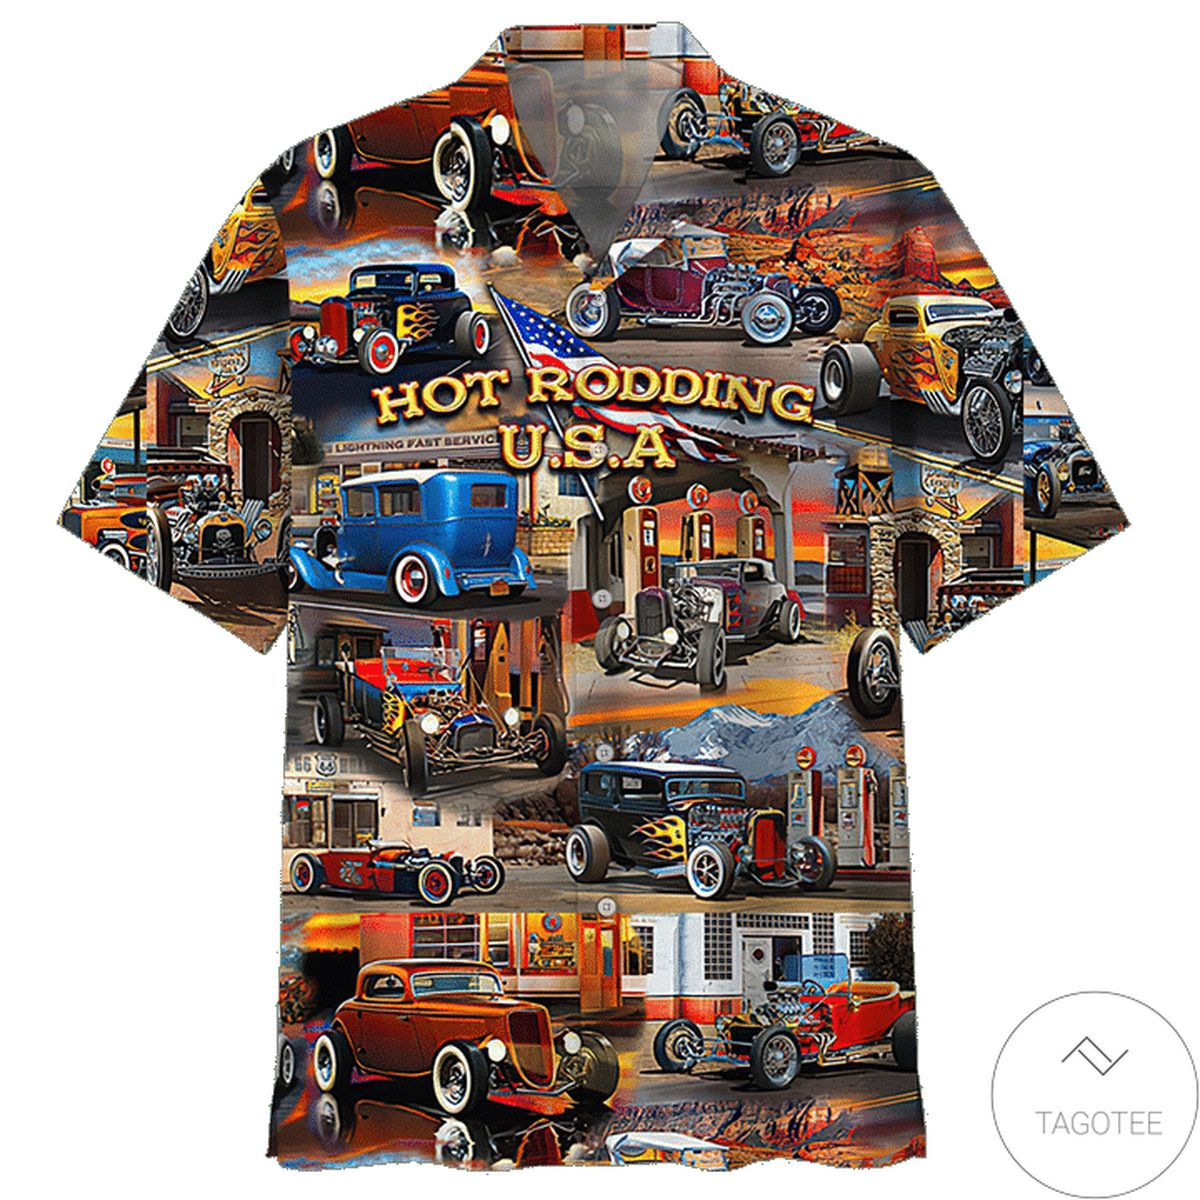 Limited Edition Hot Rodding Usa Hawaiian Shirt